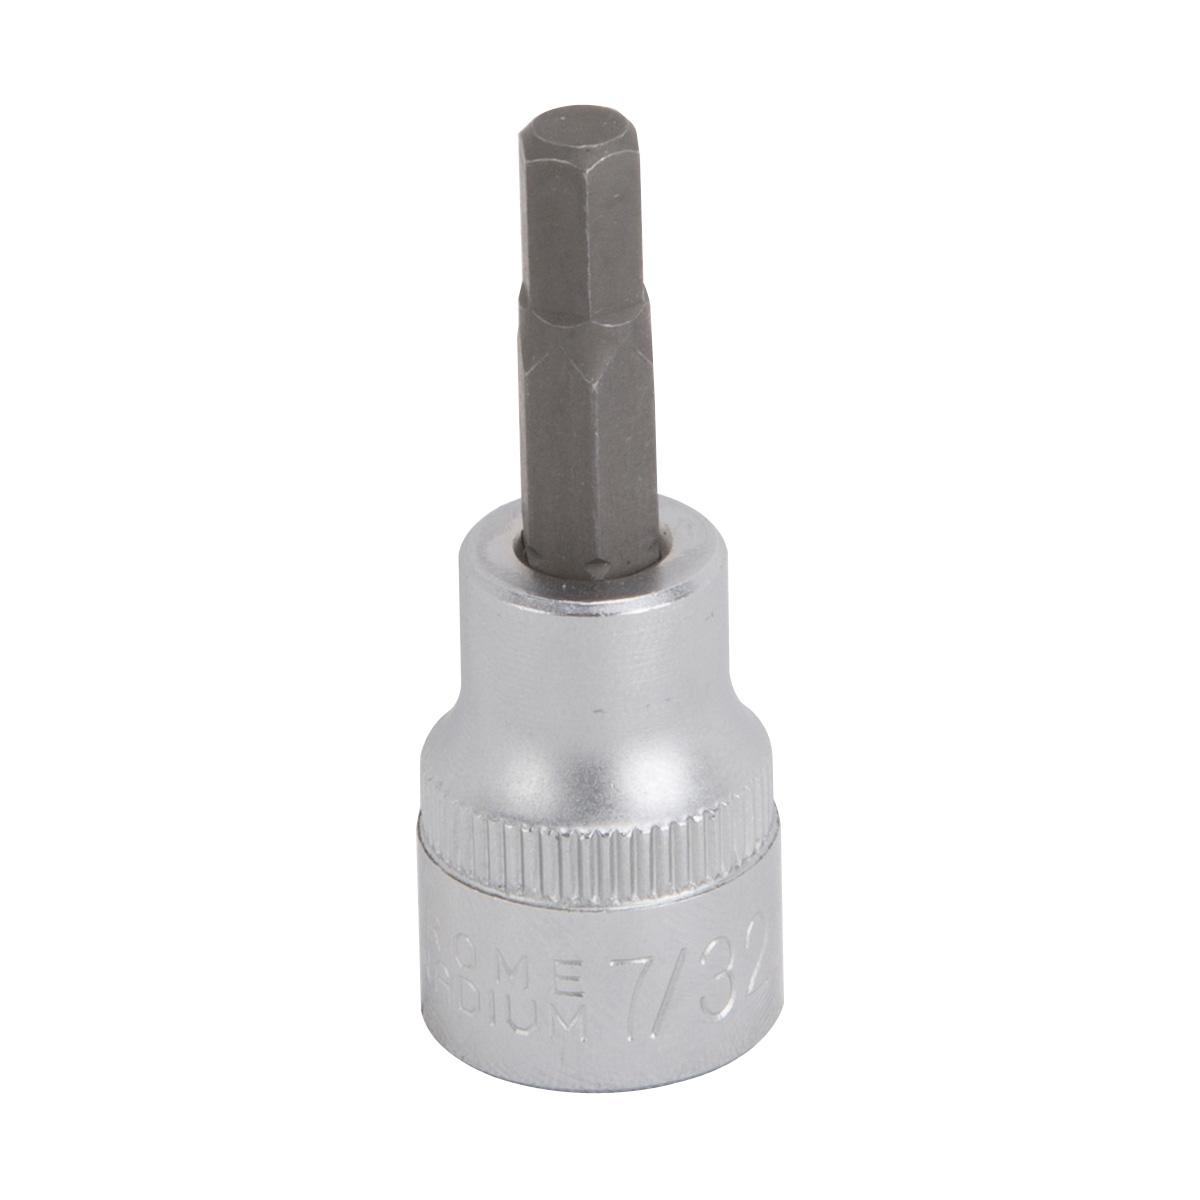 Picture of Vulcan 3506005720 Fractional Hex Bit Socket, 7/32 in Tip, 3/8 in Drive, Chrome Vanadium